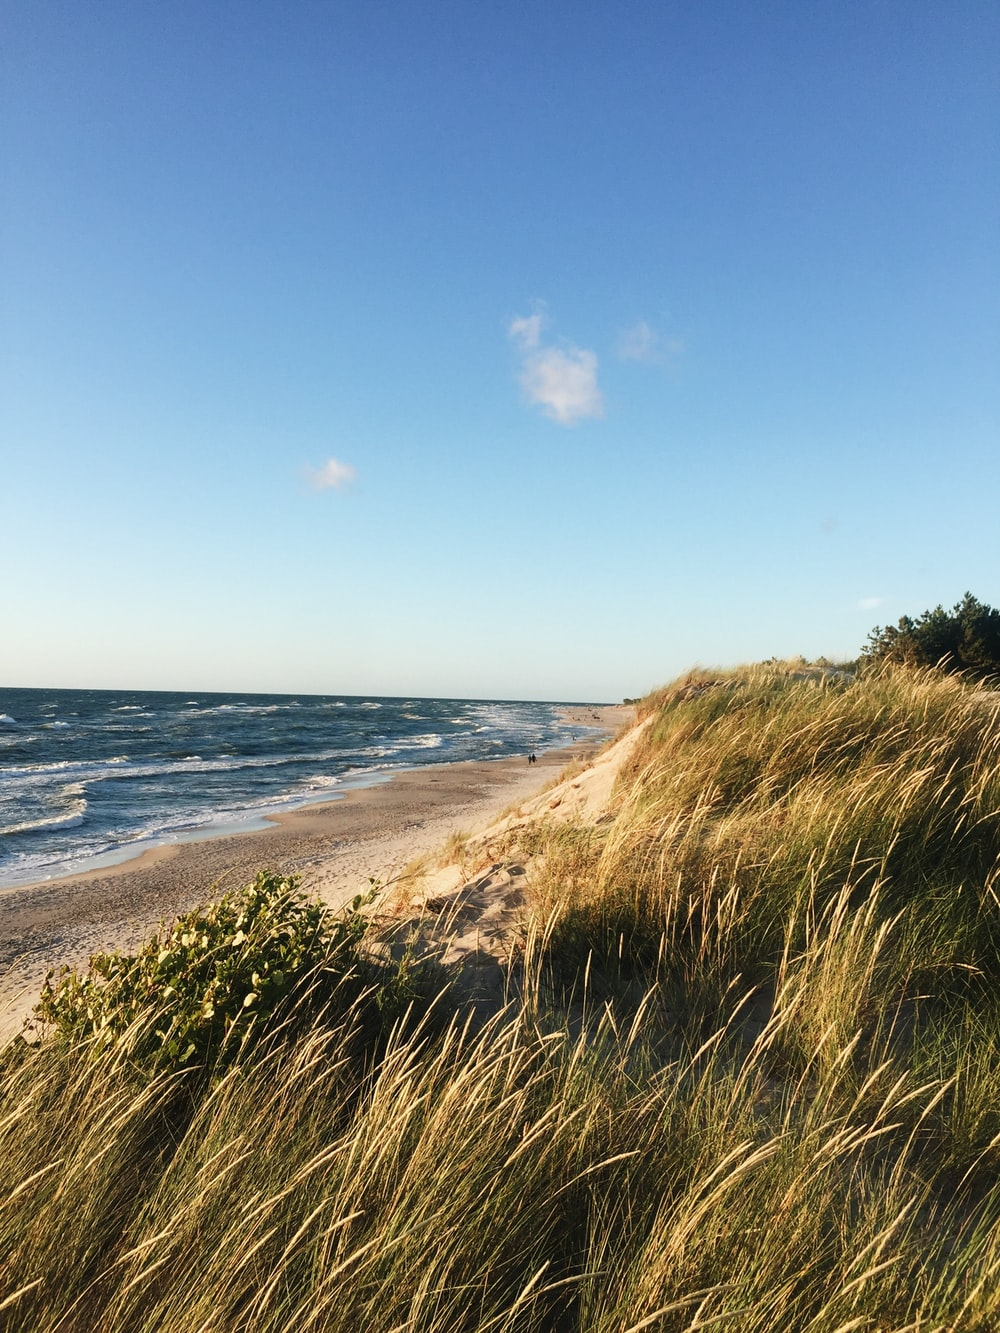 green grass near sea under blue sky during daytime